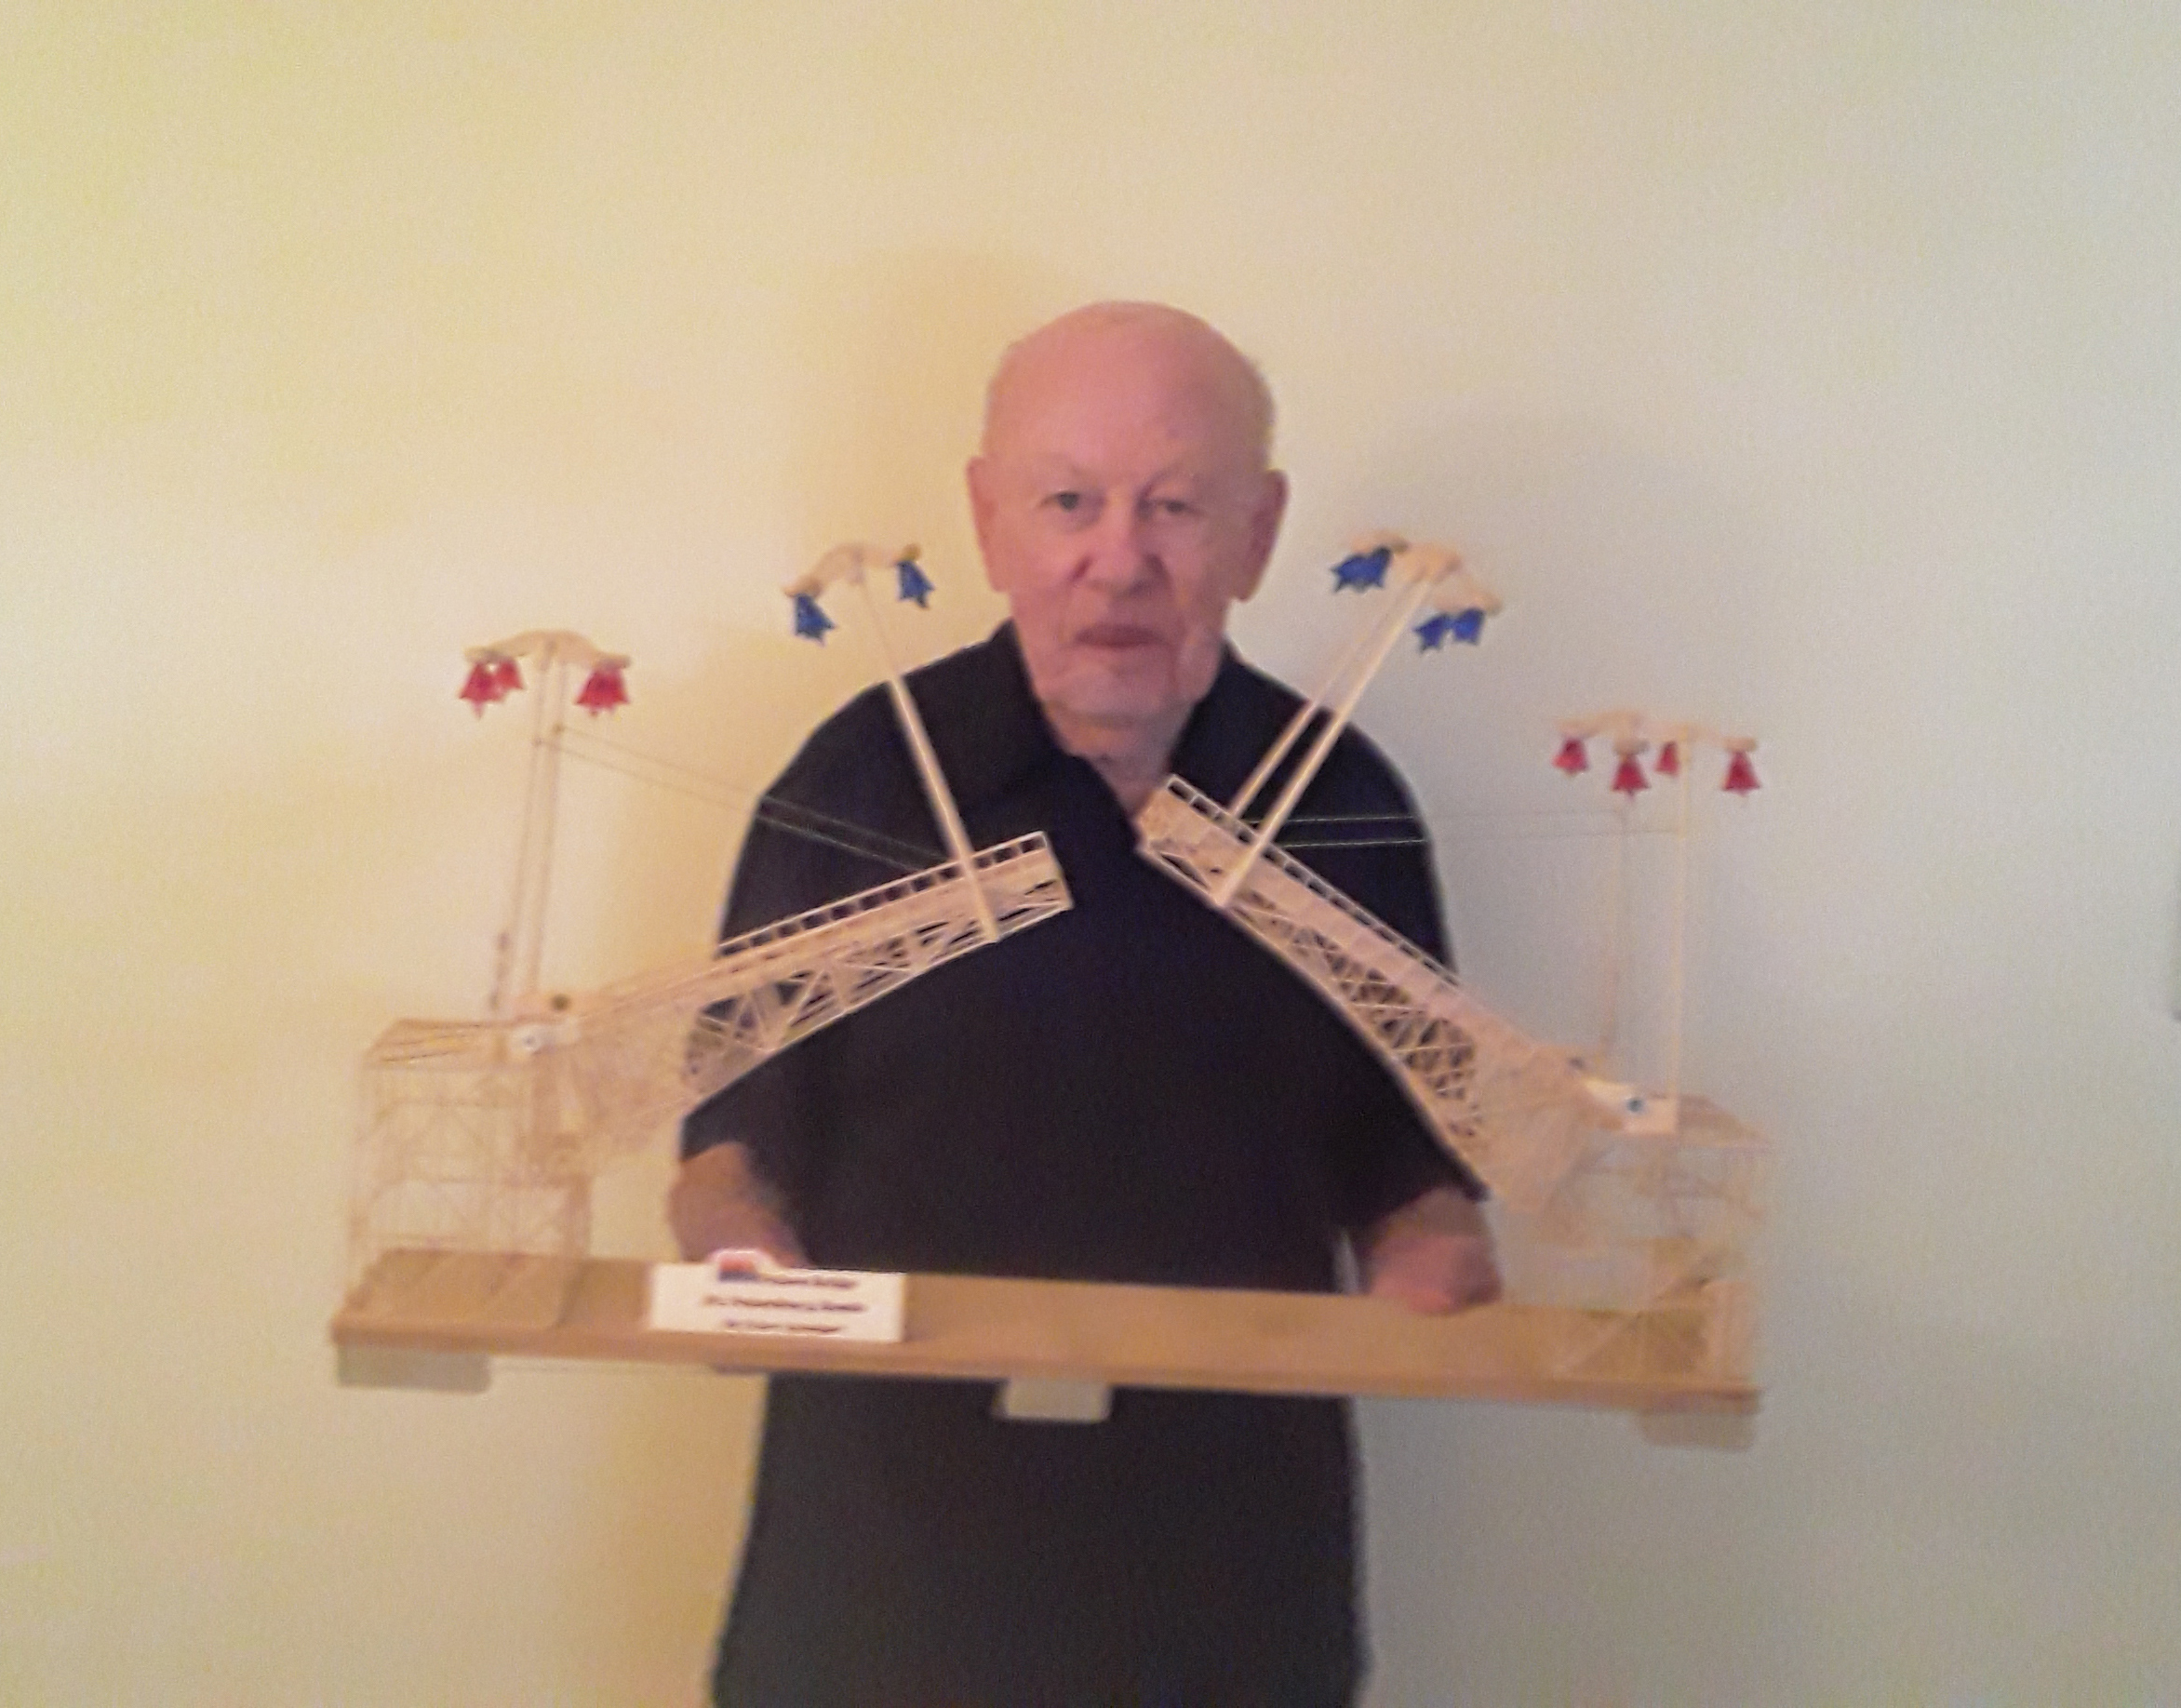 Survivor Spotlight: Yakov Ayzengart's Toothpick Structures